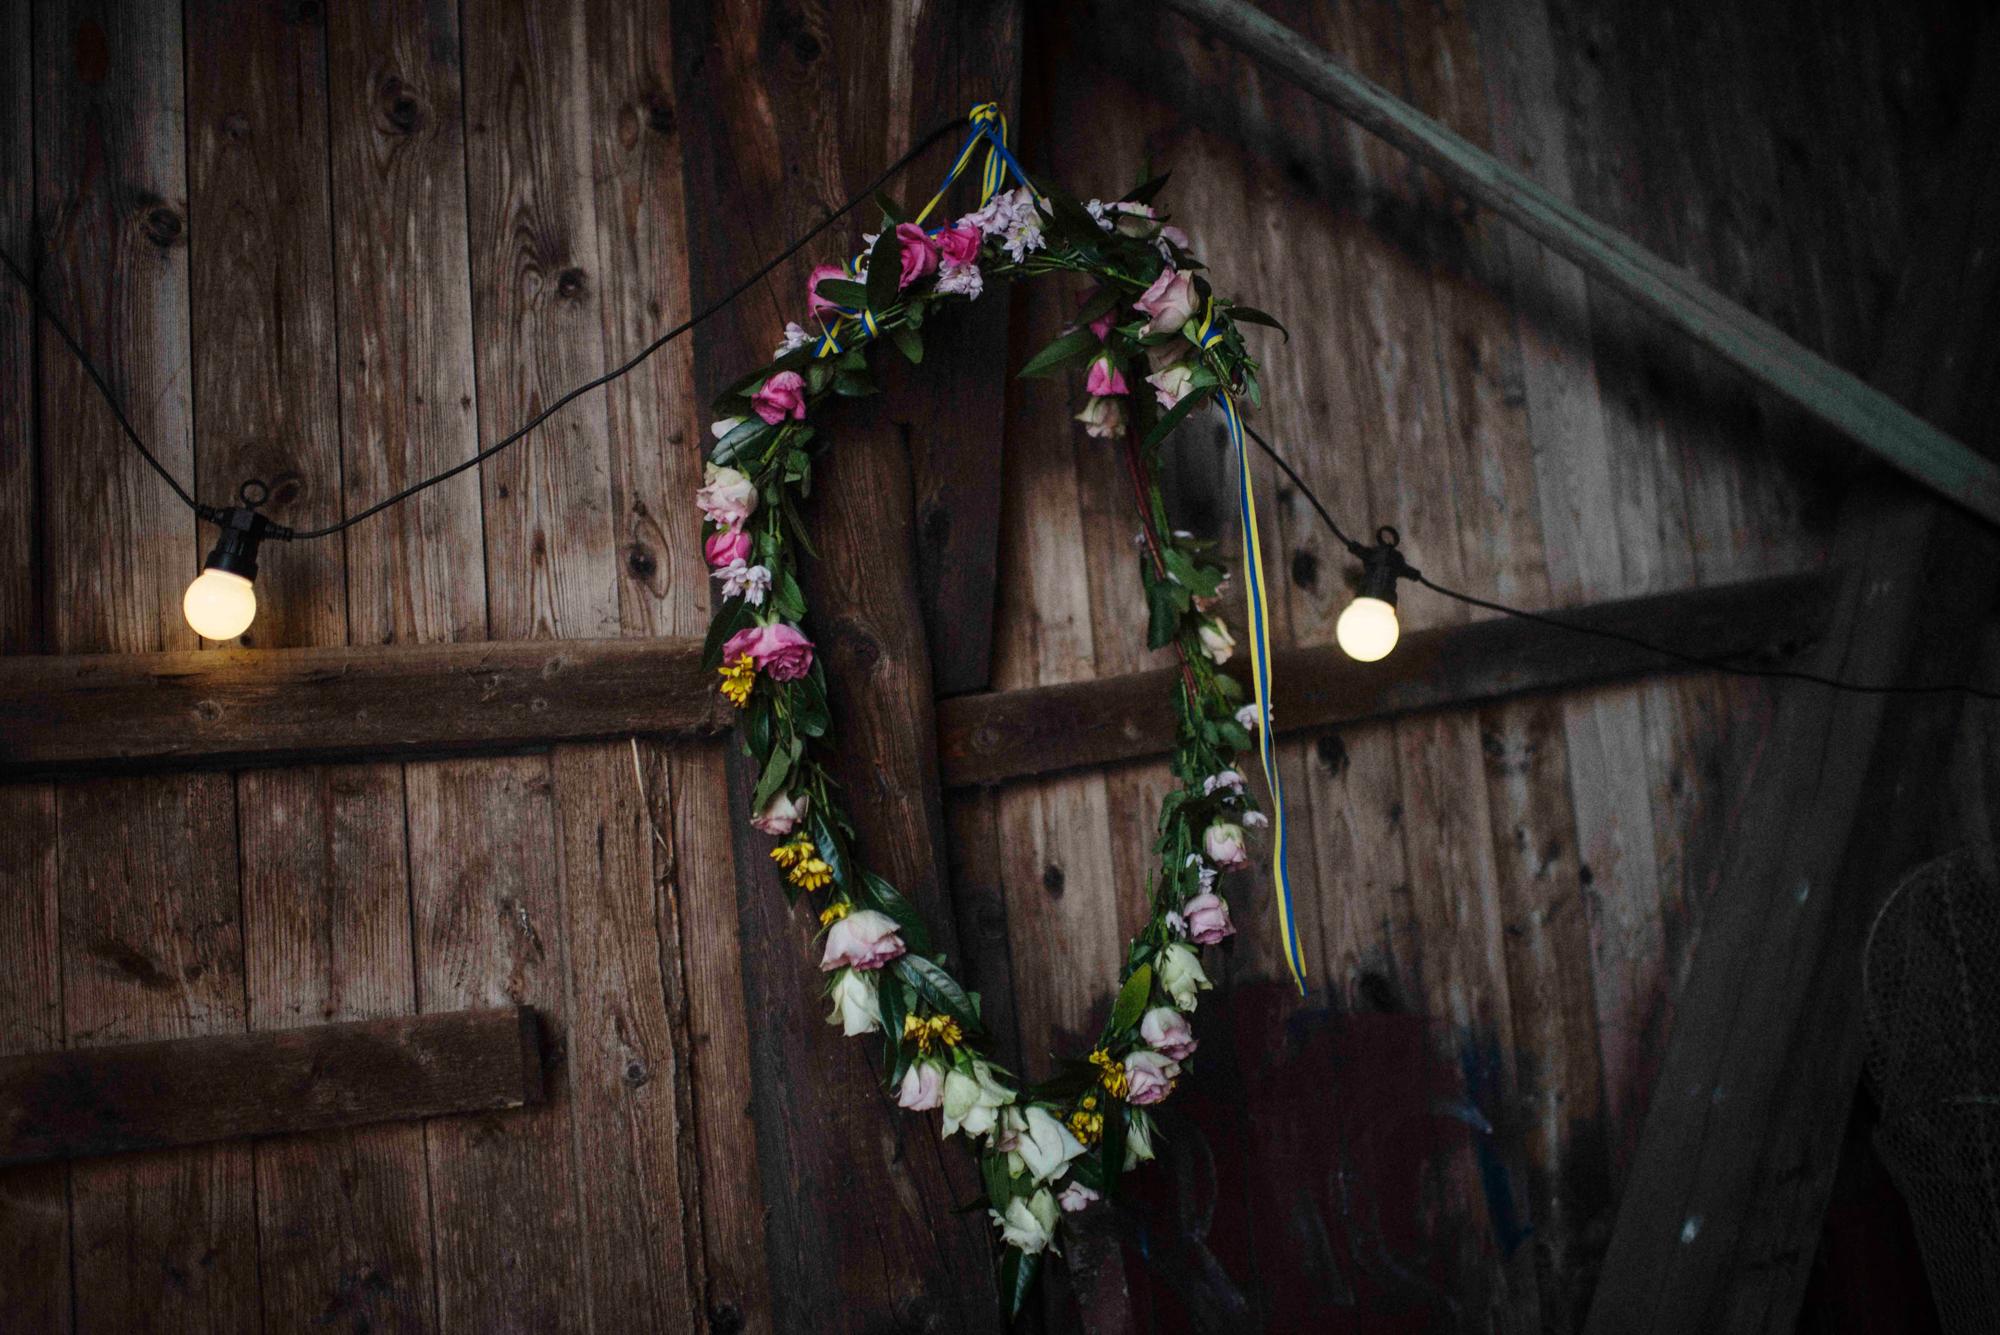 brandochbrindle_anineoscar_bröllop_finnhamn_DSC_0178.jpg